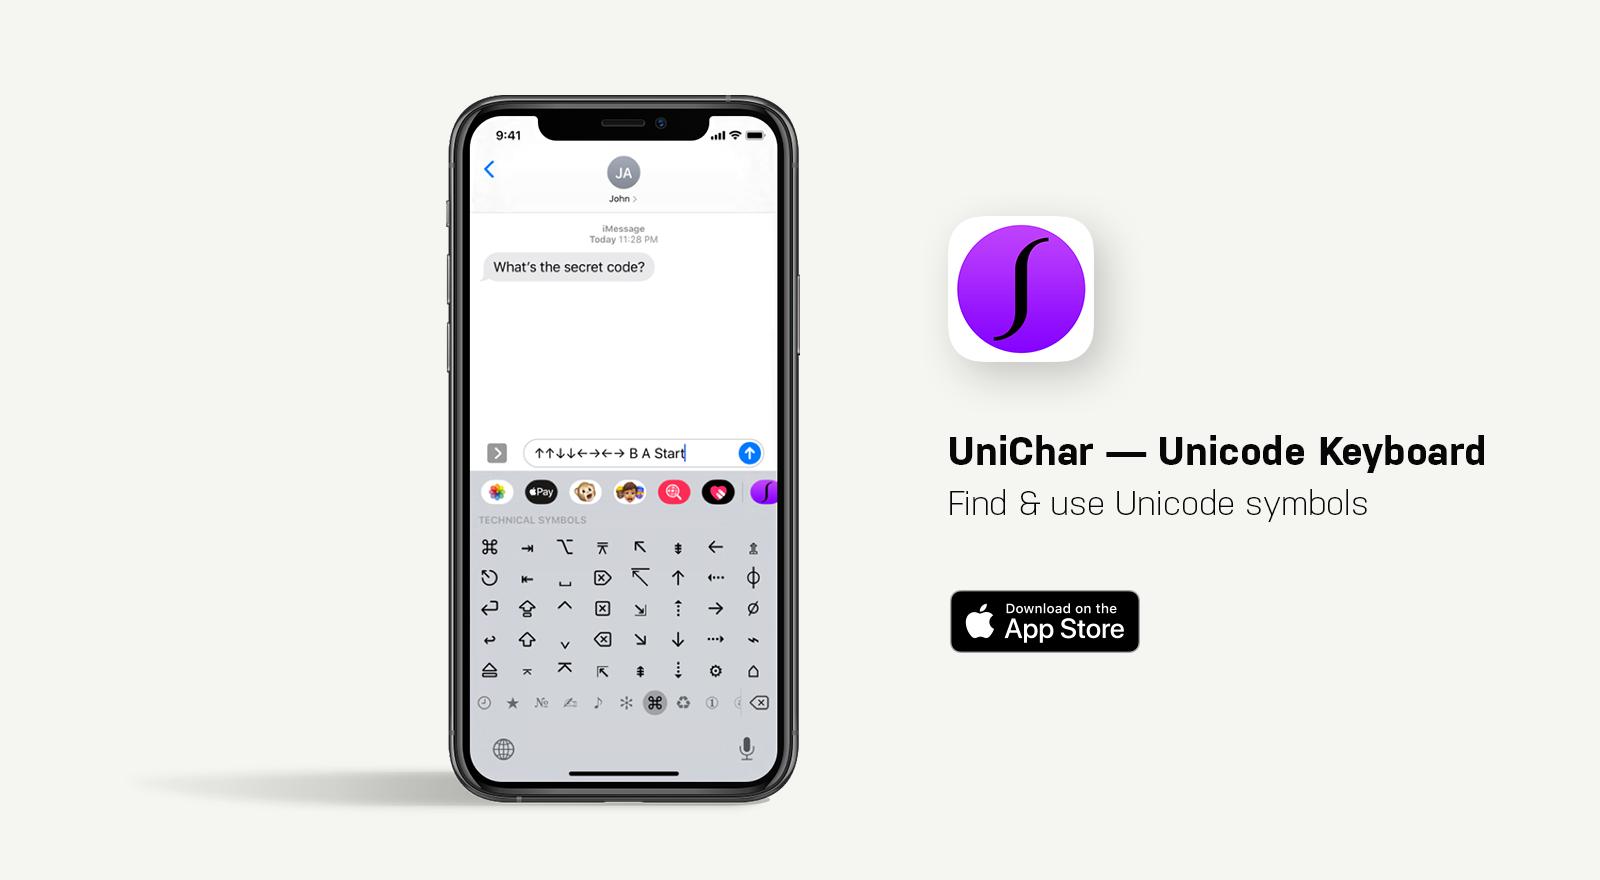 unichar app